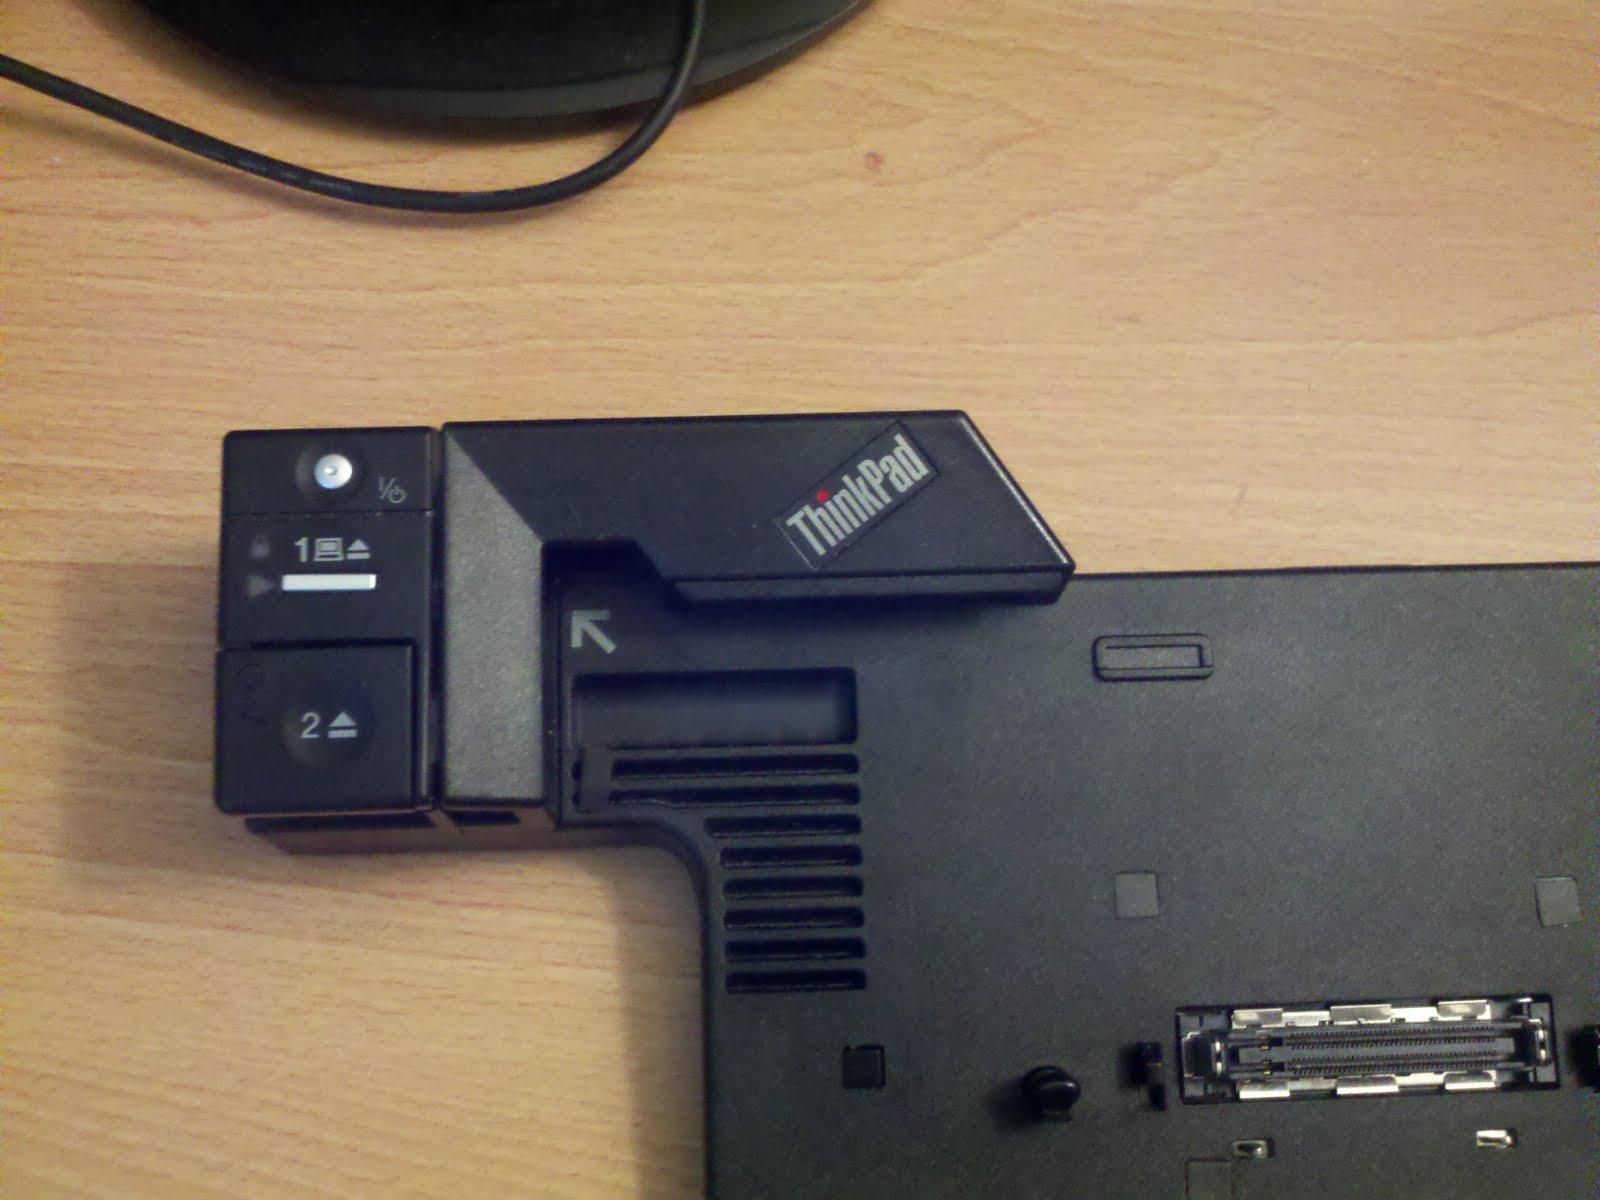 Shiwaki L/üfter K/ühler Ersatzteil F/ür Lenovo Thinkpad T500 W500 Laptop